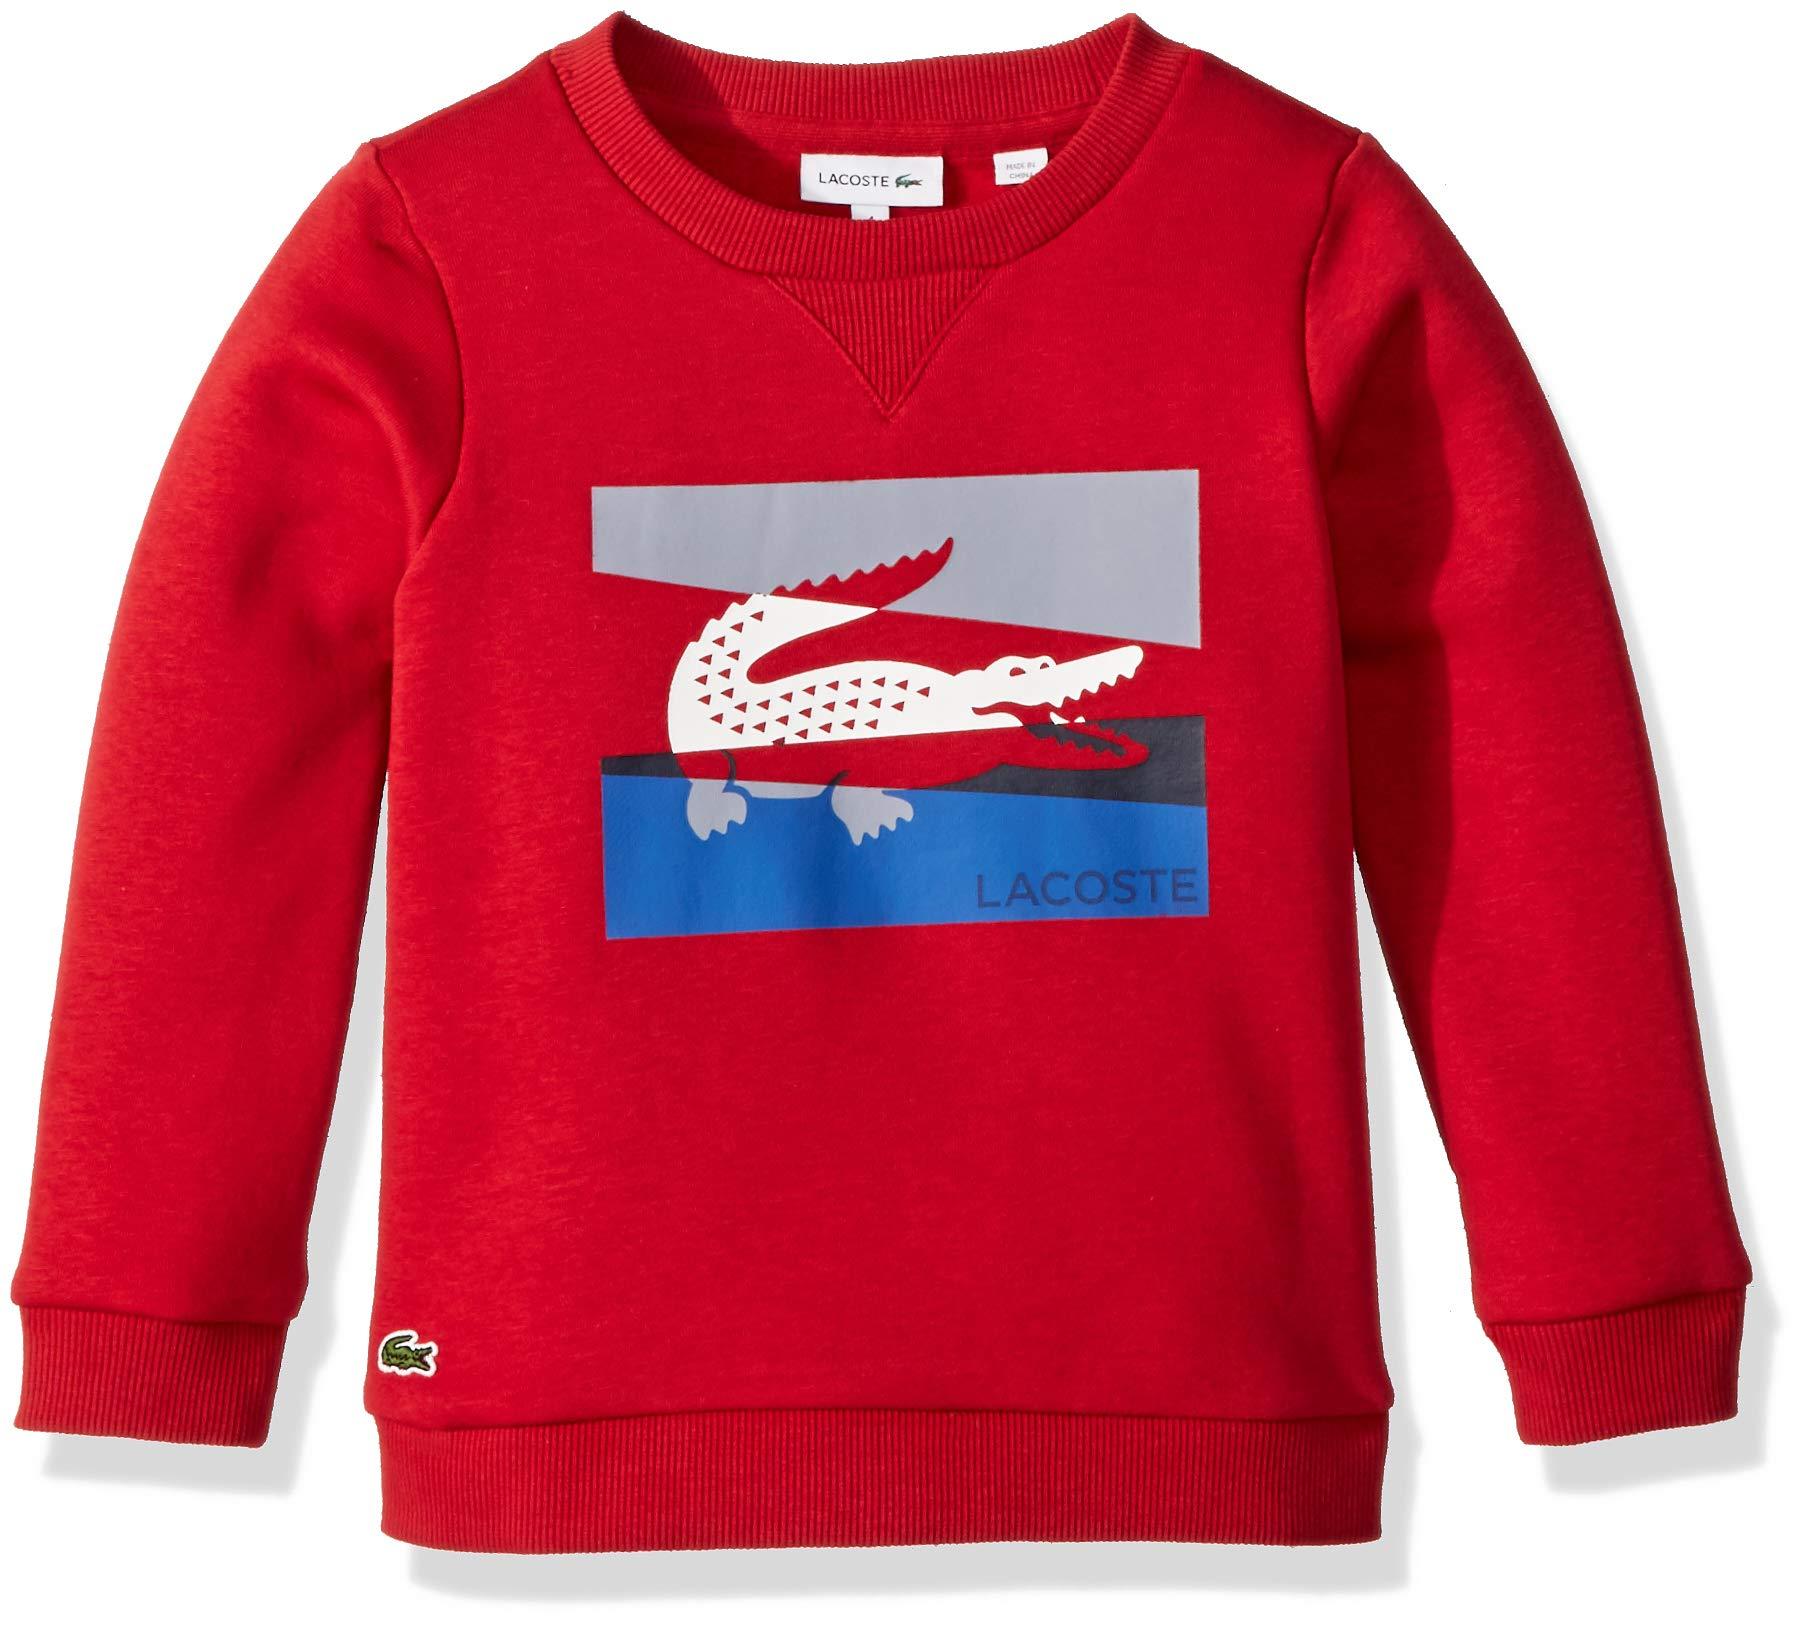 Lacoste Little Boy Multico Animation Sweatshirt, Lighthouse red, 5